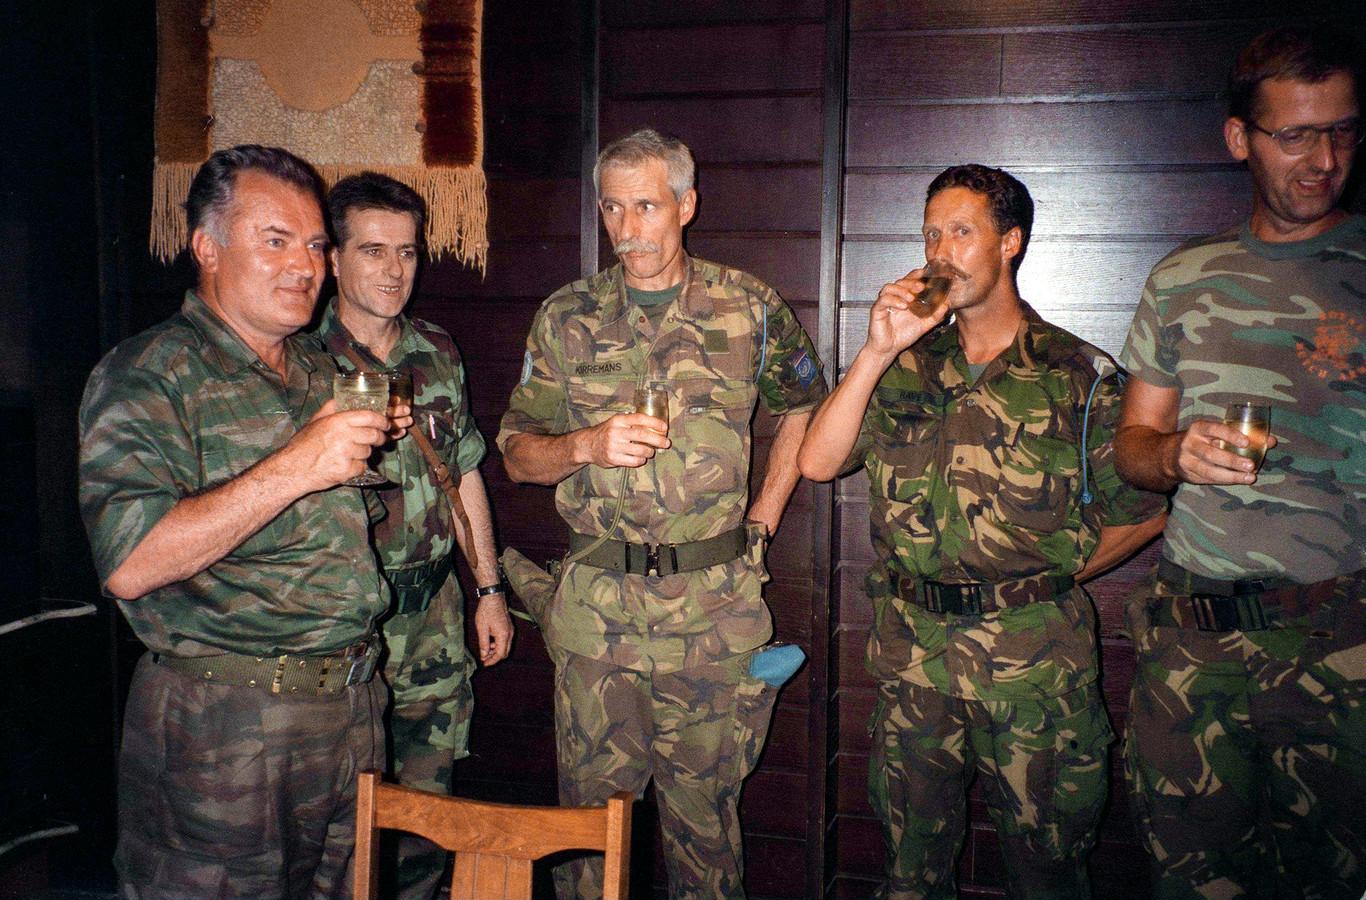 Generaal Ratko Mladic en Dutchbat-commandant Thom Karremans.